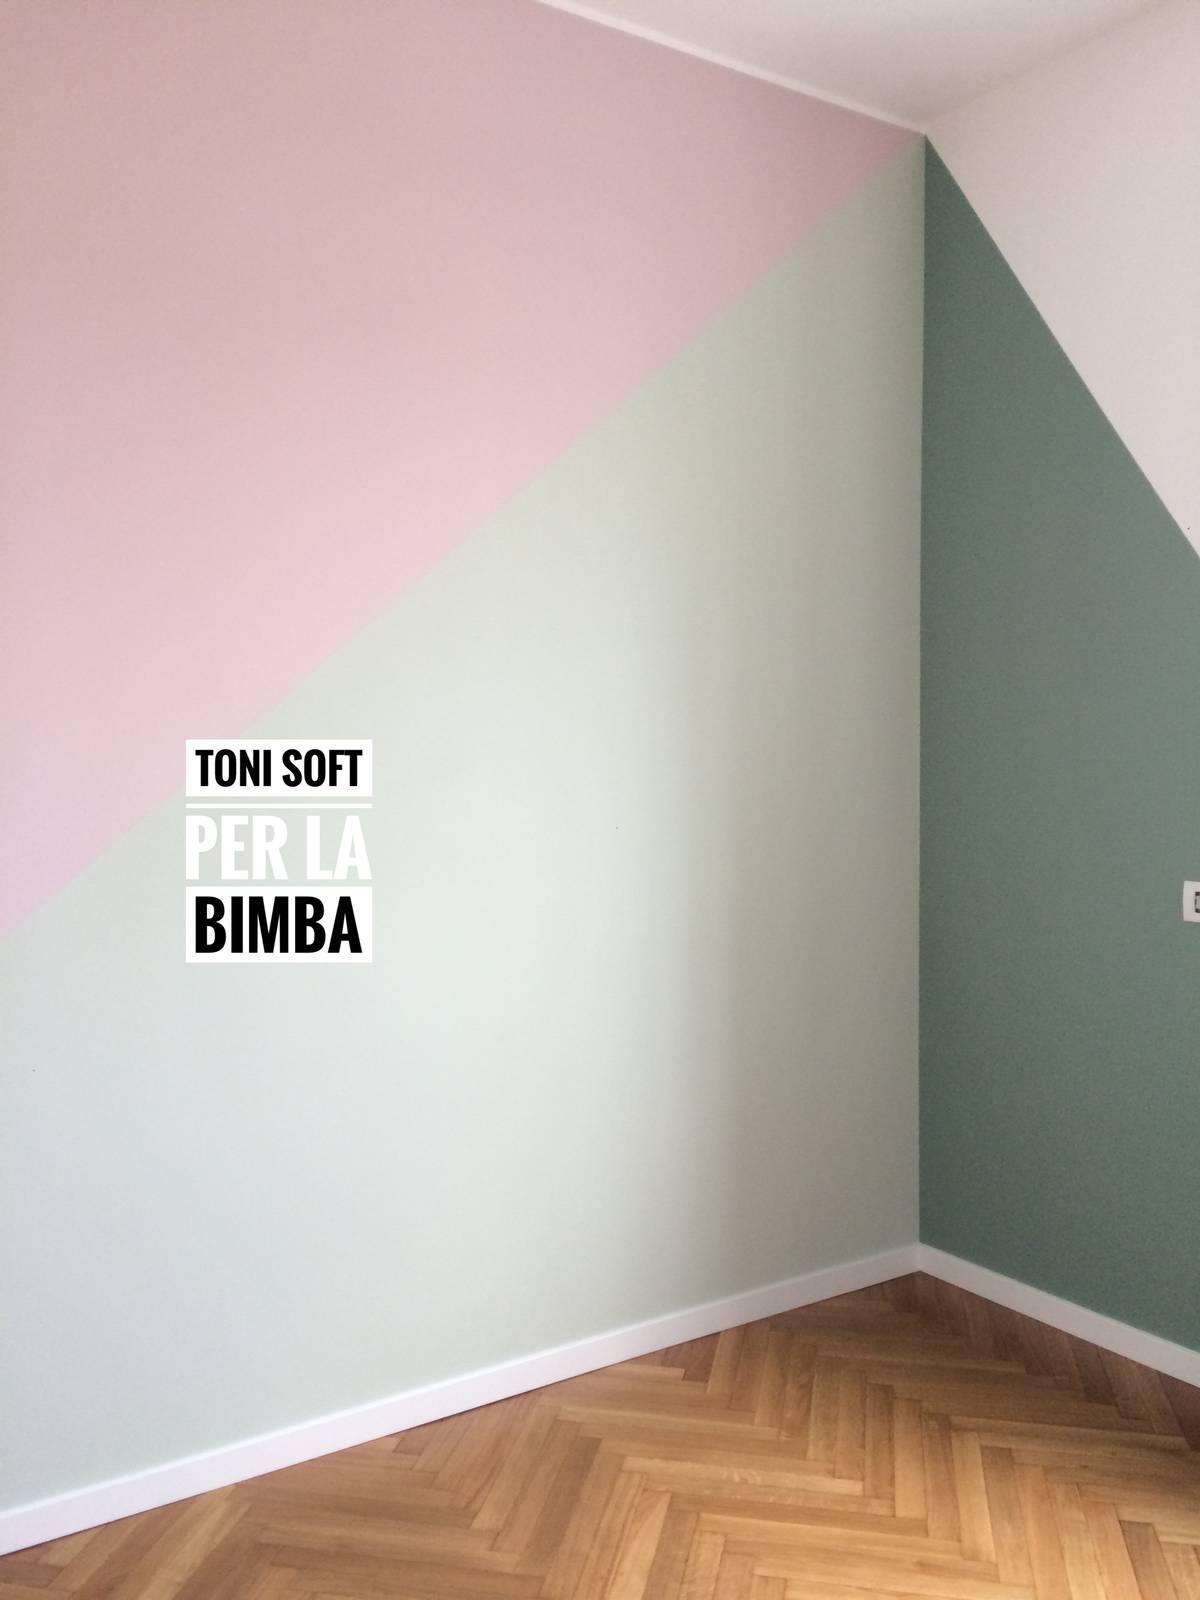 Colori Per Pareti Casa Moderna pitture per le pareti: quali colori? - cose di casa